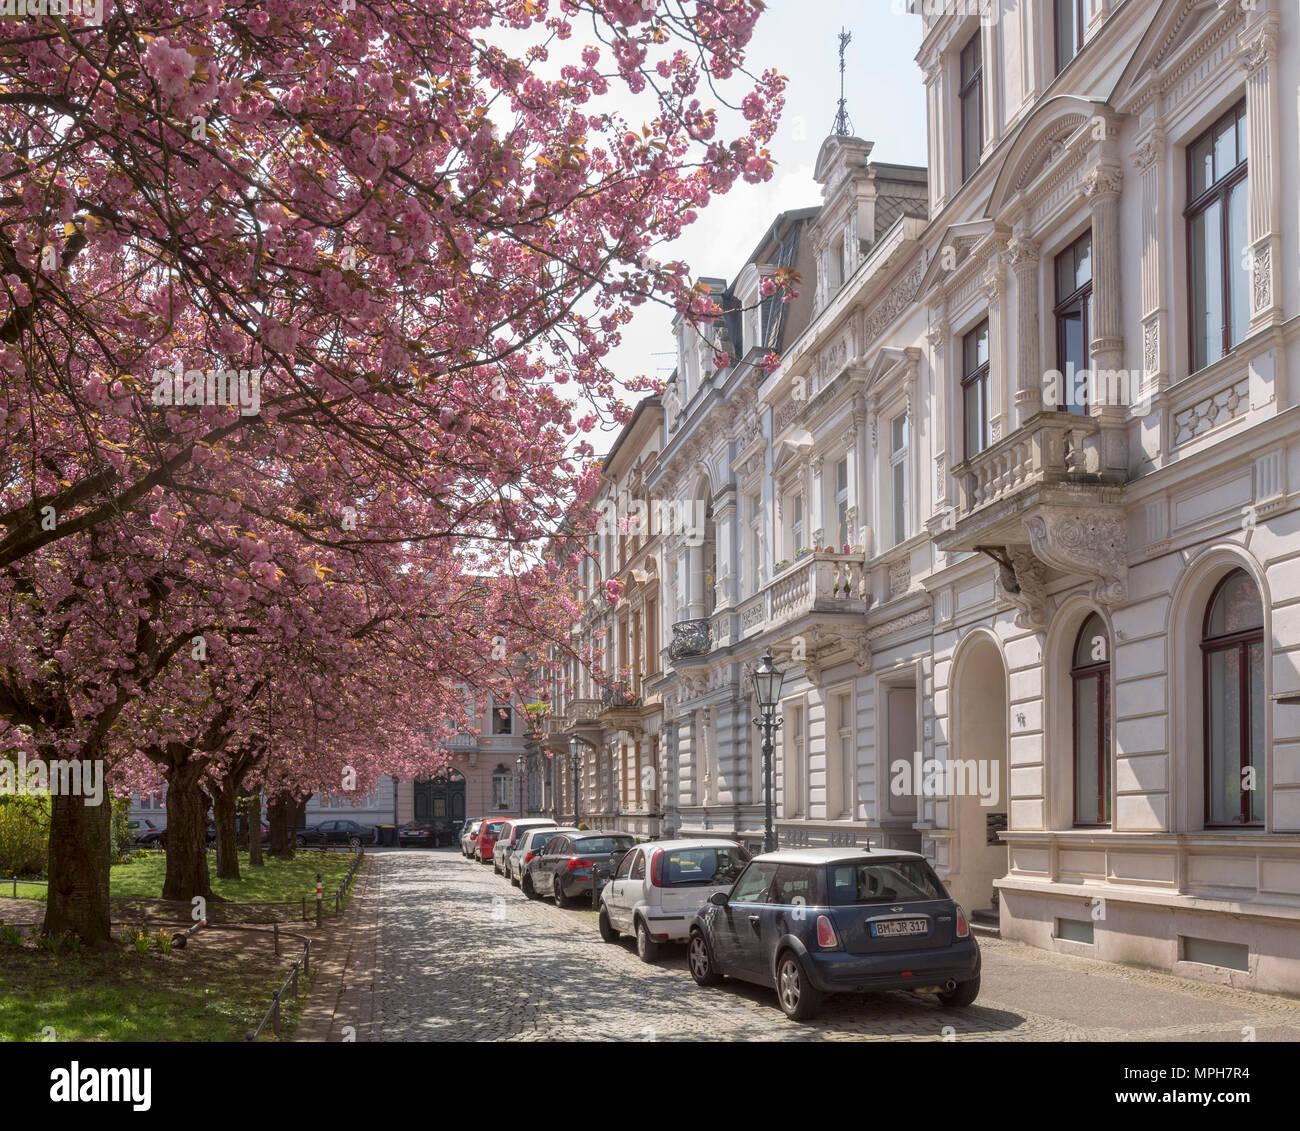 Krefeld, Alexanderplatz mit blühenden Kirschbäumen - Stock Image